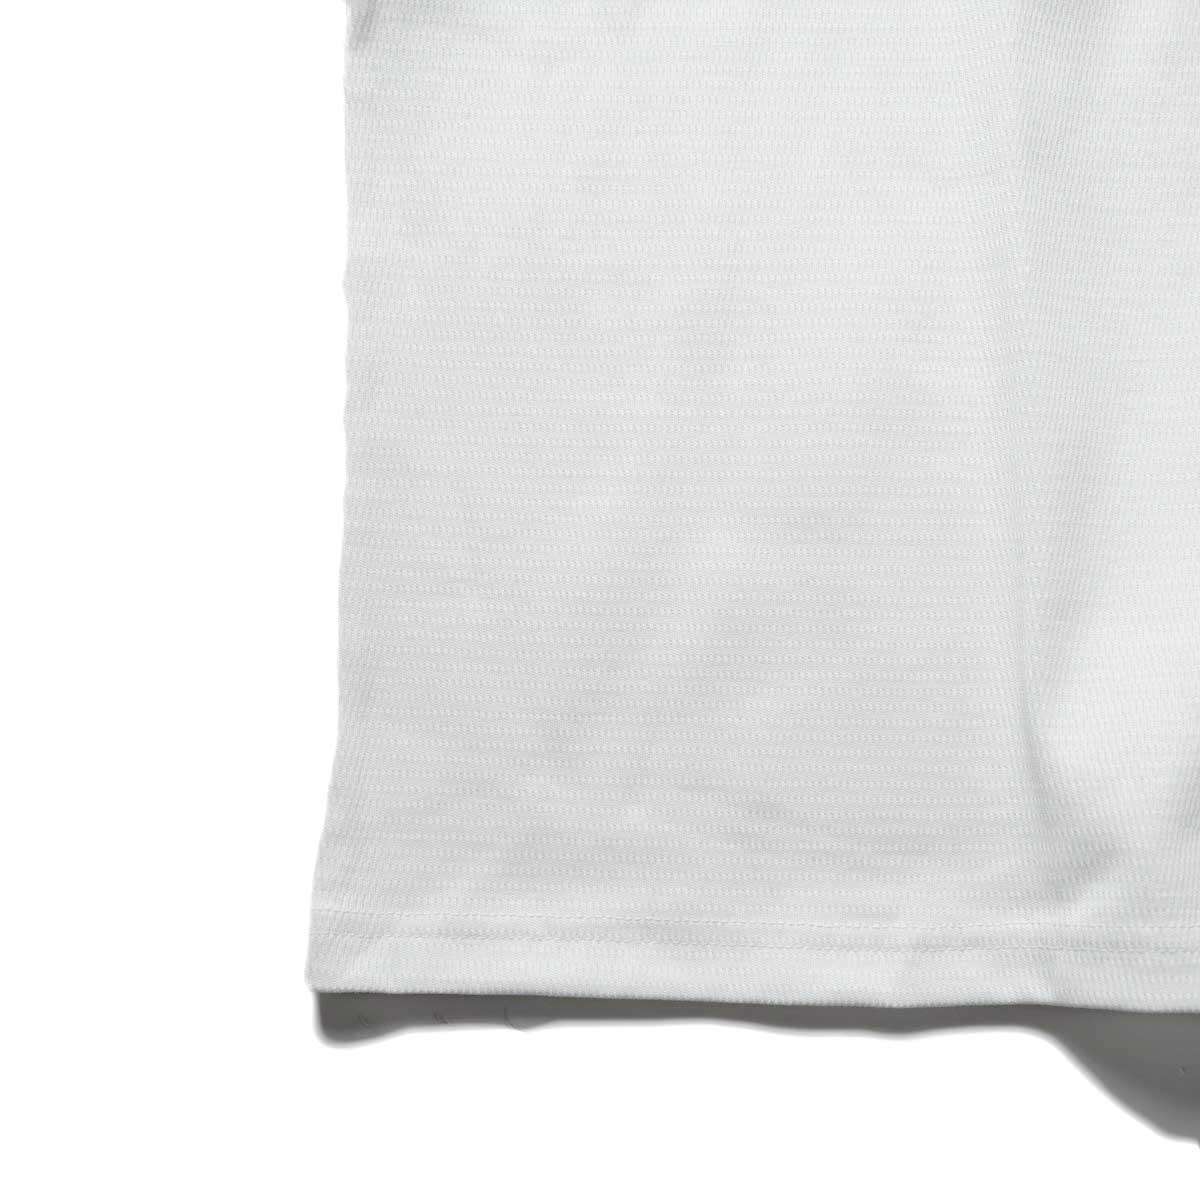 FUTURE PRIMITIVE / FP THERMAL V T-SHIRT (White)裾